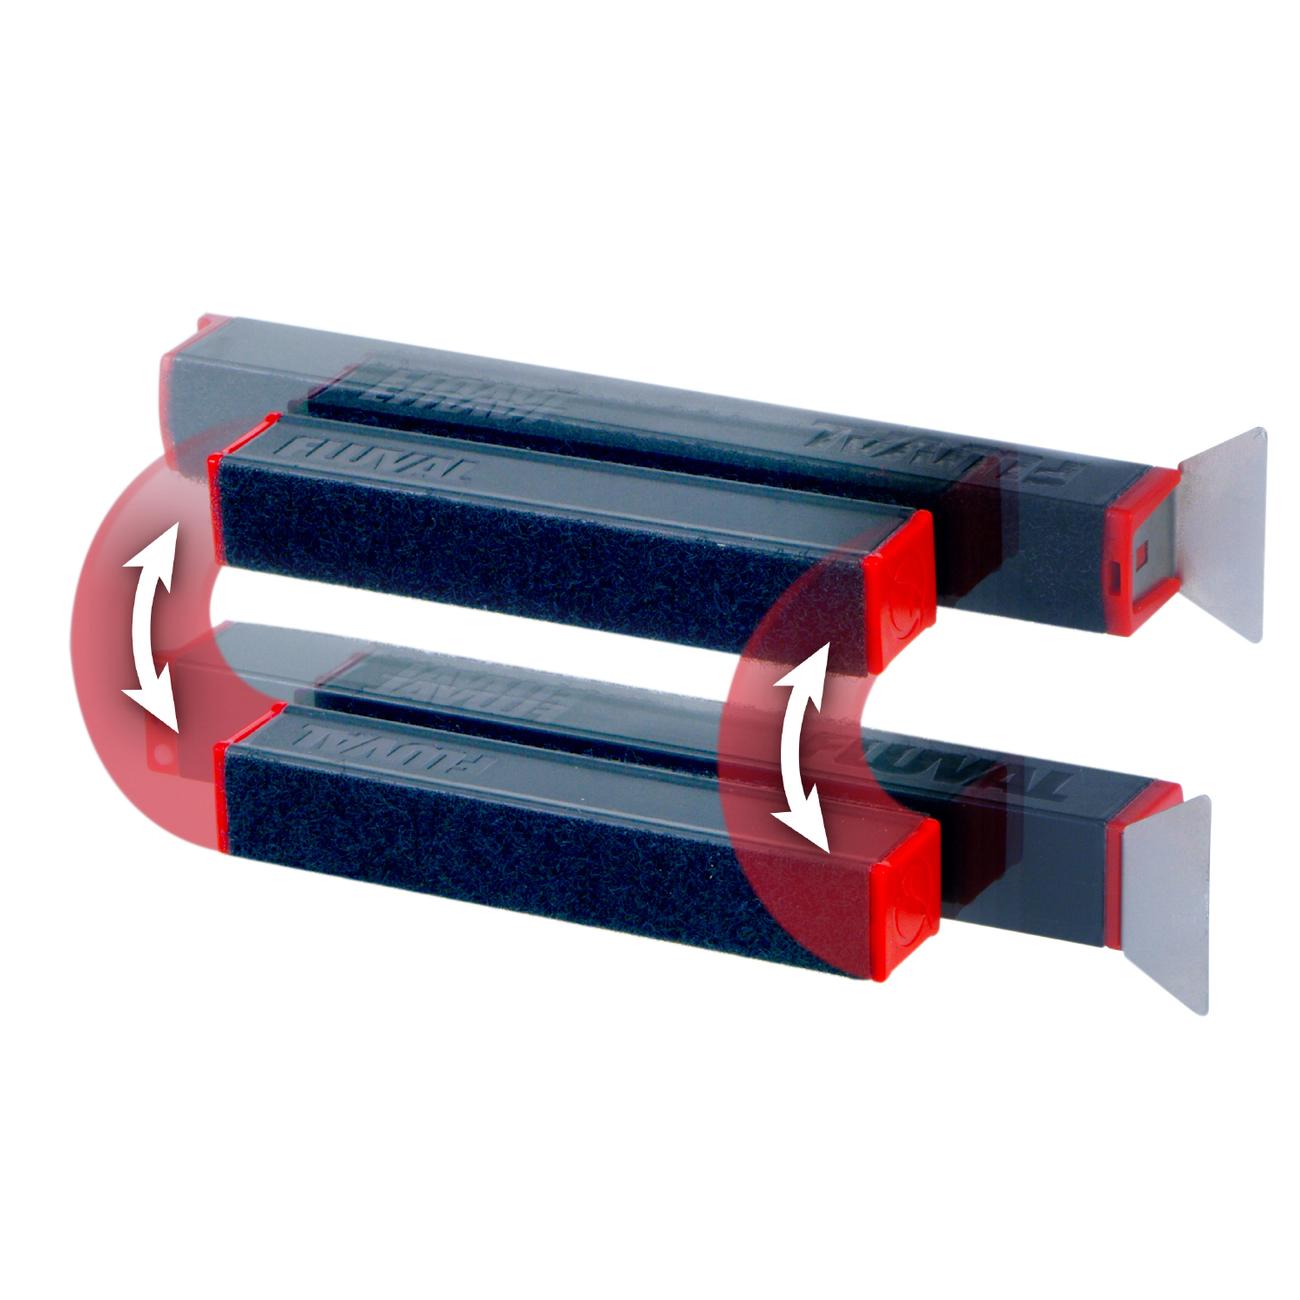 Fluval Razor-Algenmagnet mit Klinge, Bild 7